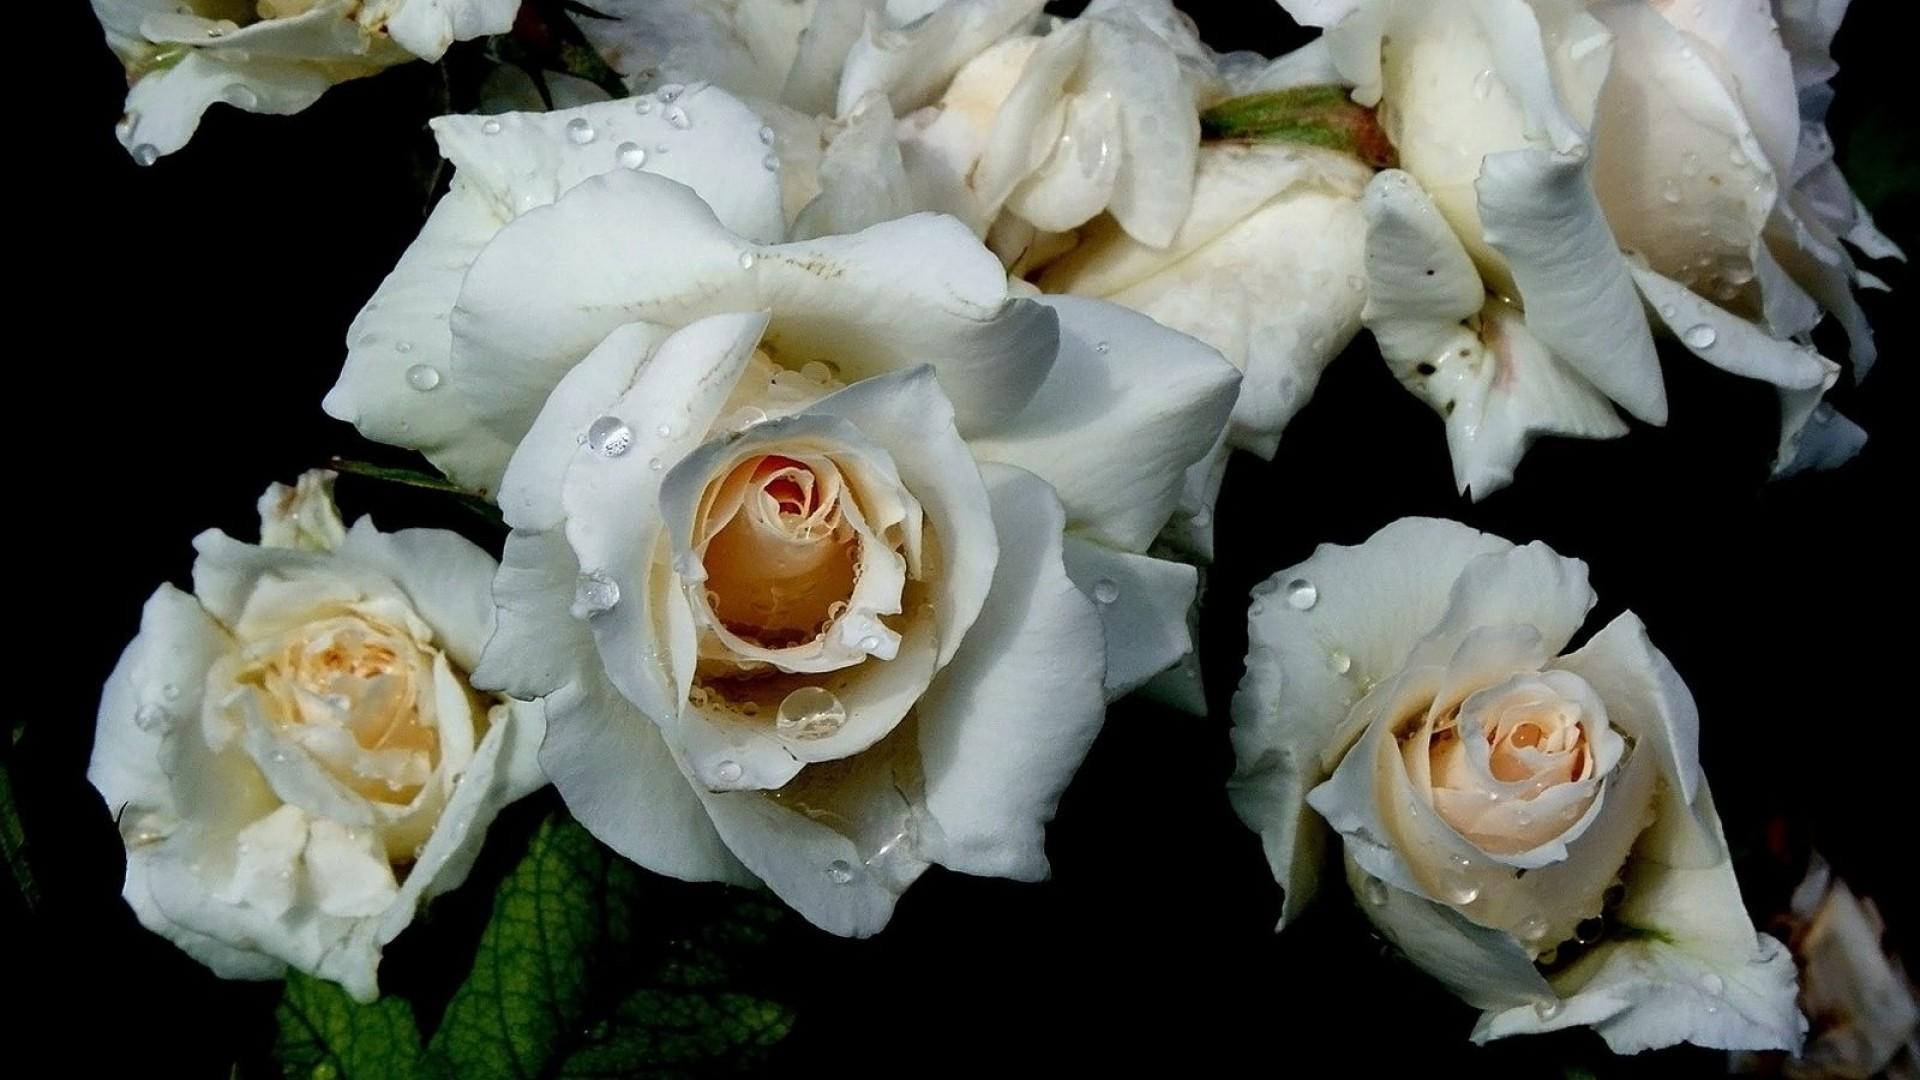 white flower wallpaper 1920x1080 - photo #17